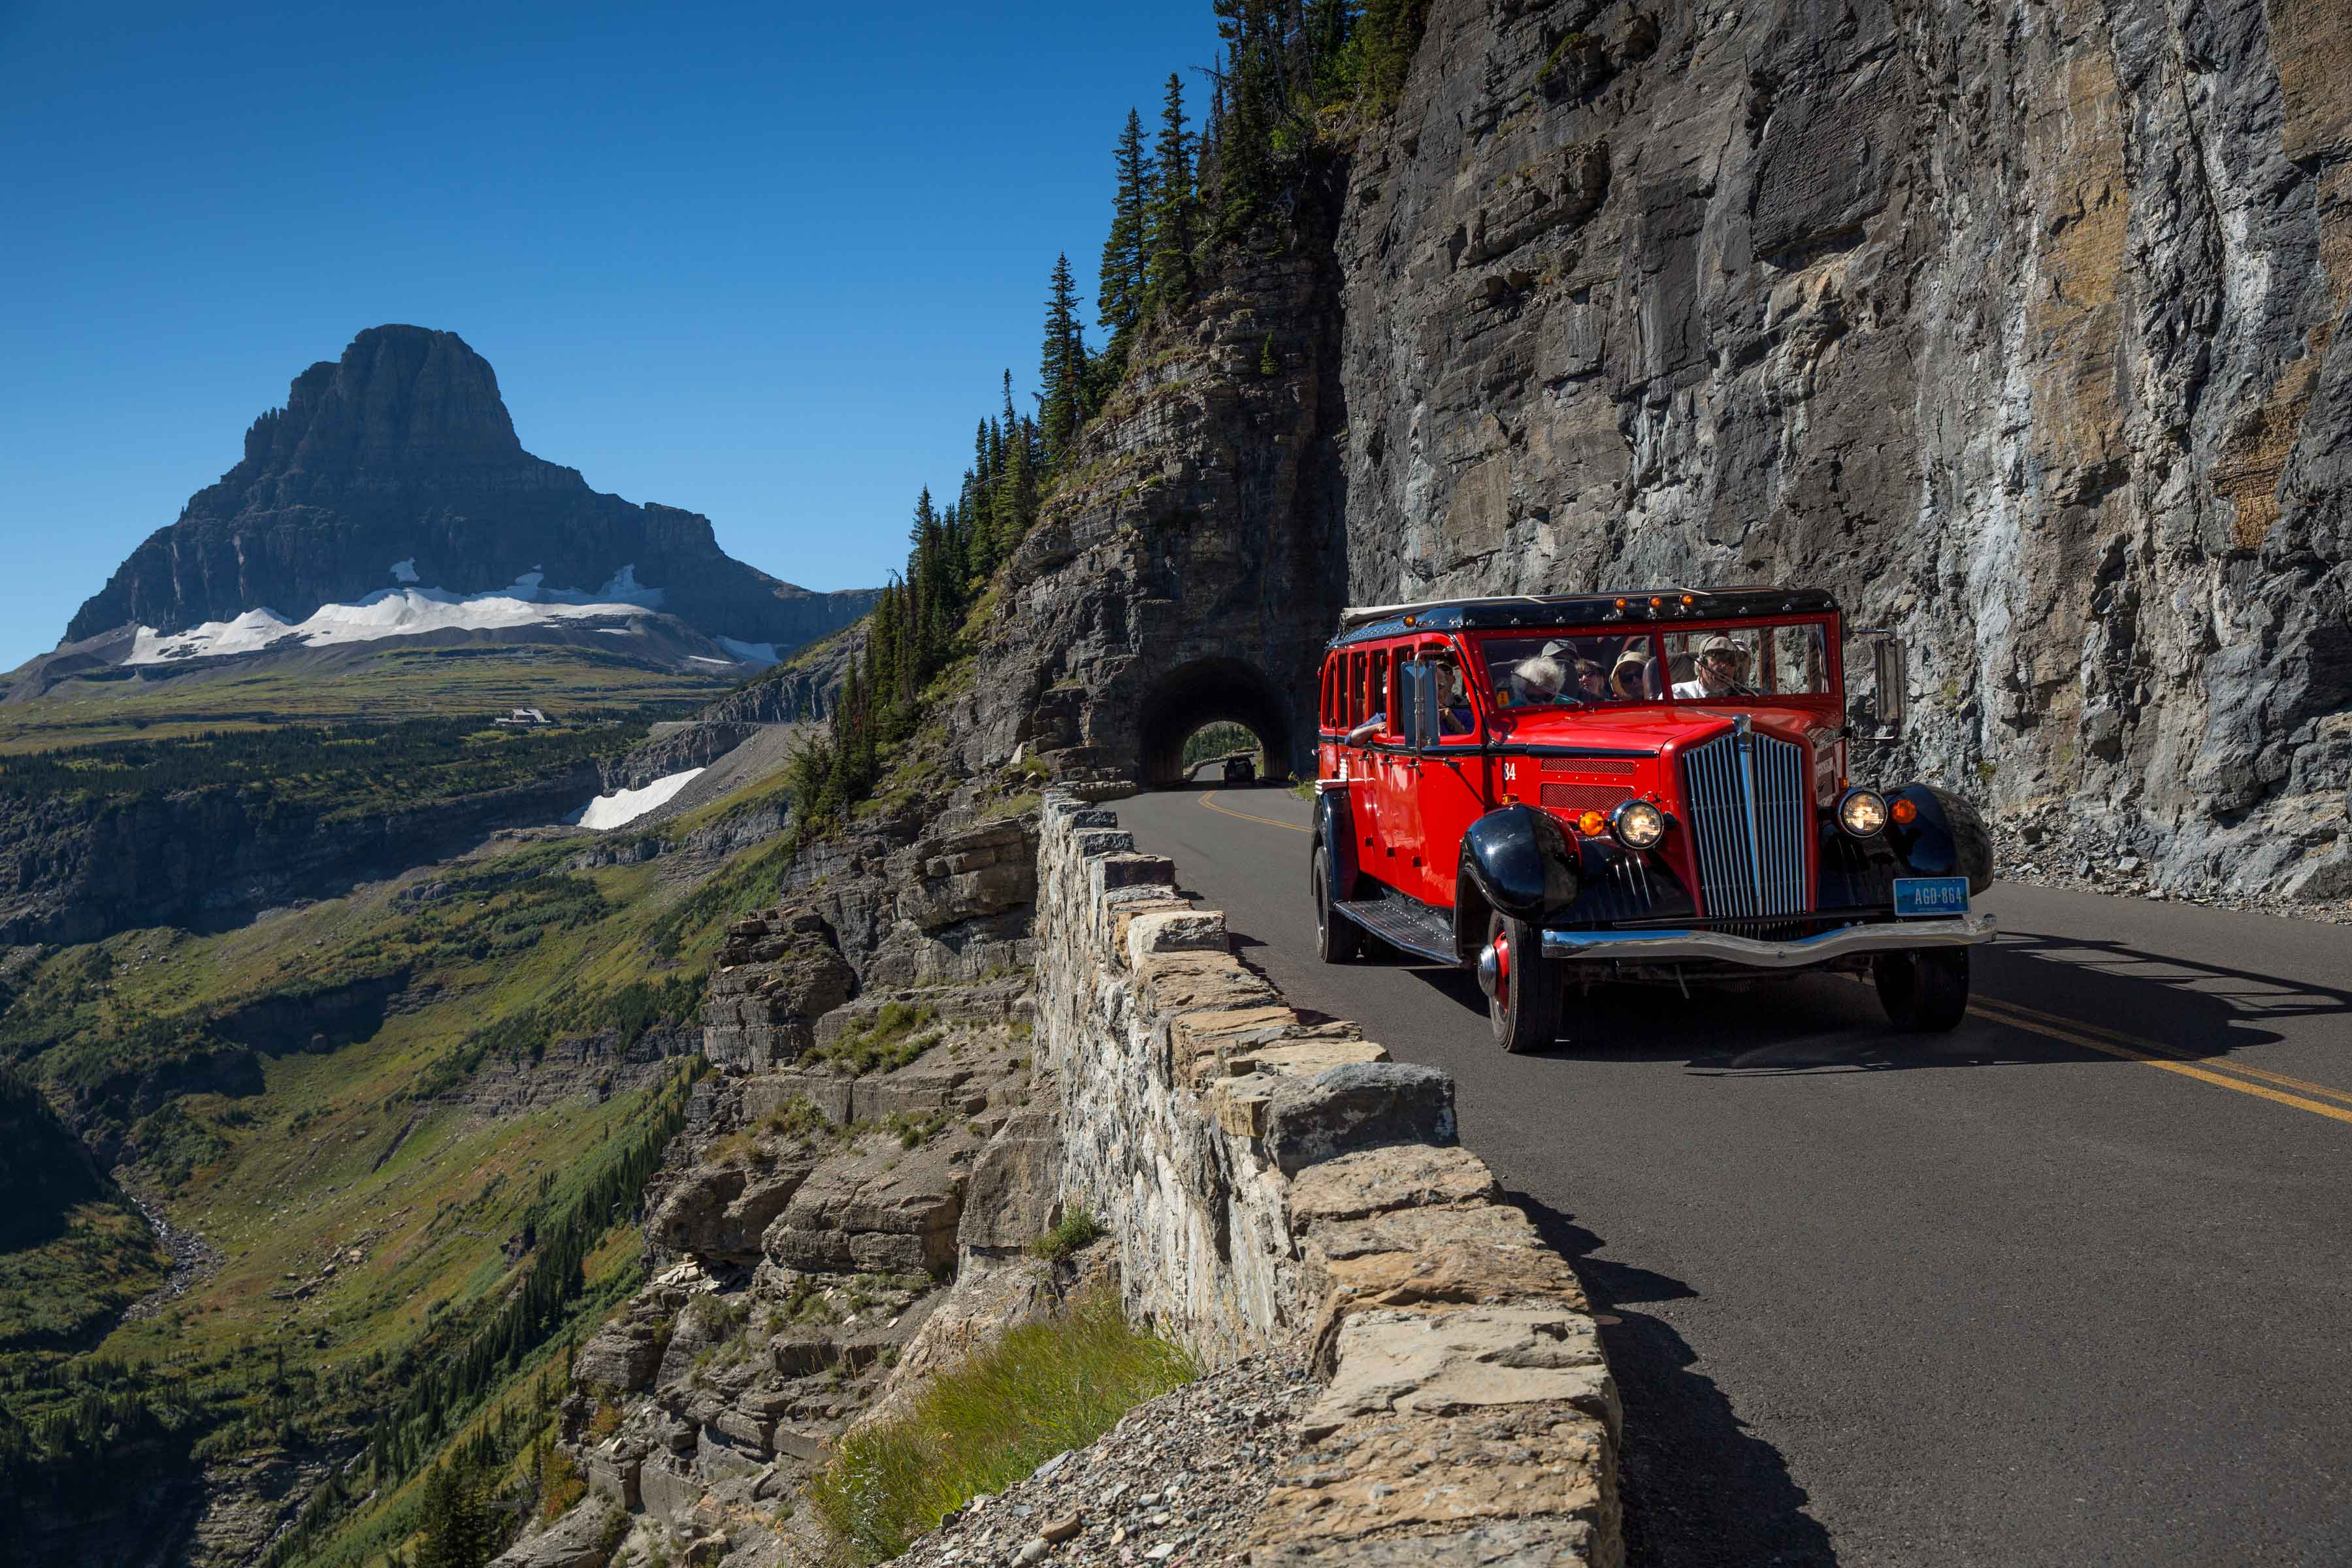 Take a Red Bus Tour